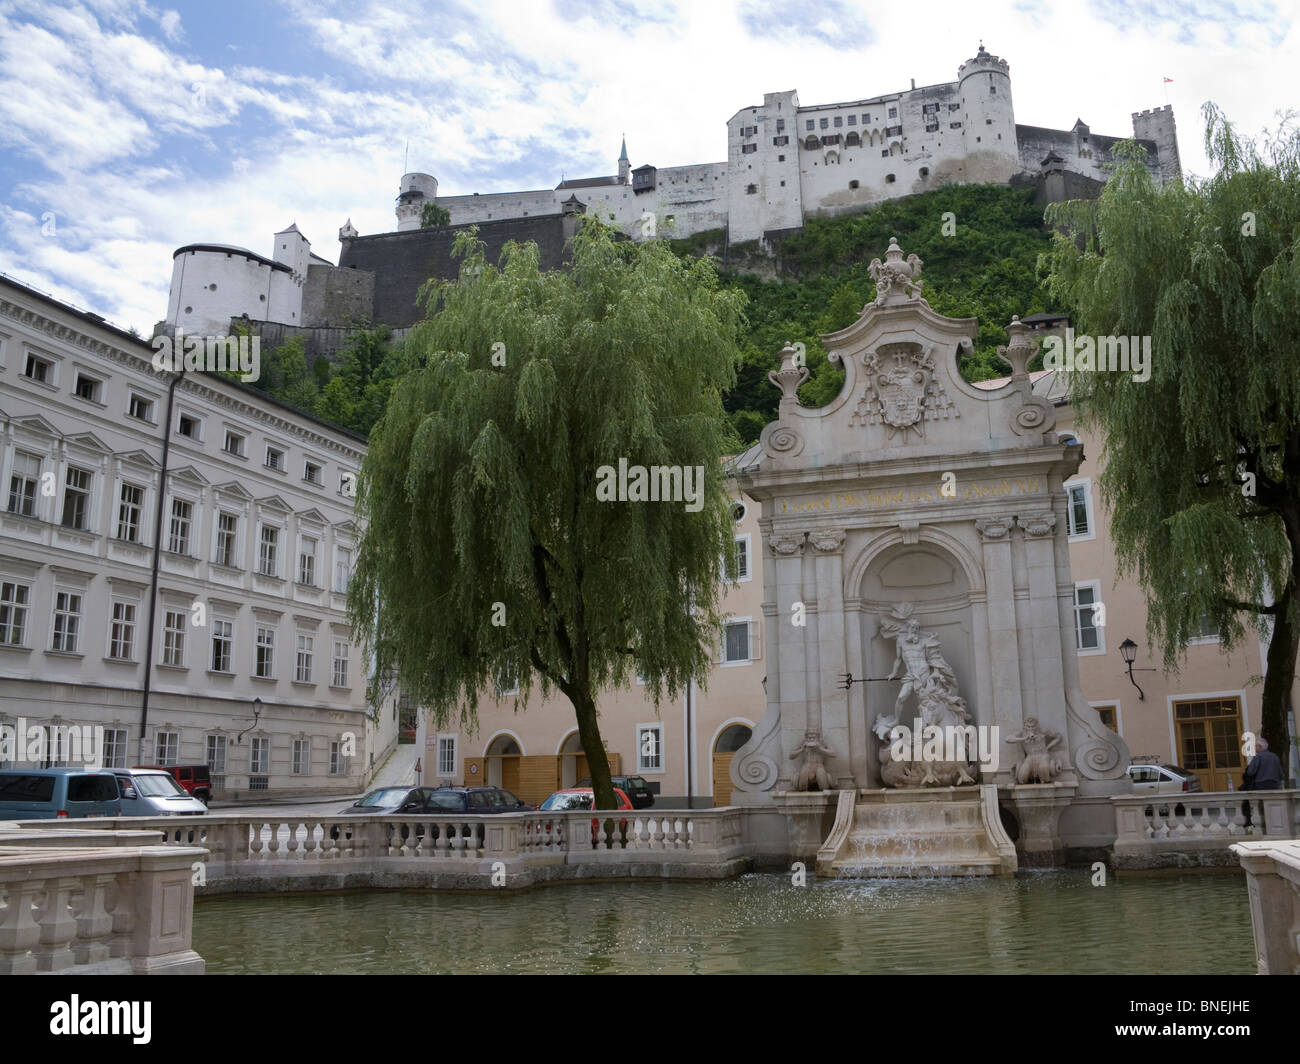 Salzburg Austria EU Kapitel horse pond in front of Hohensalzburg Fortress - Stock Image